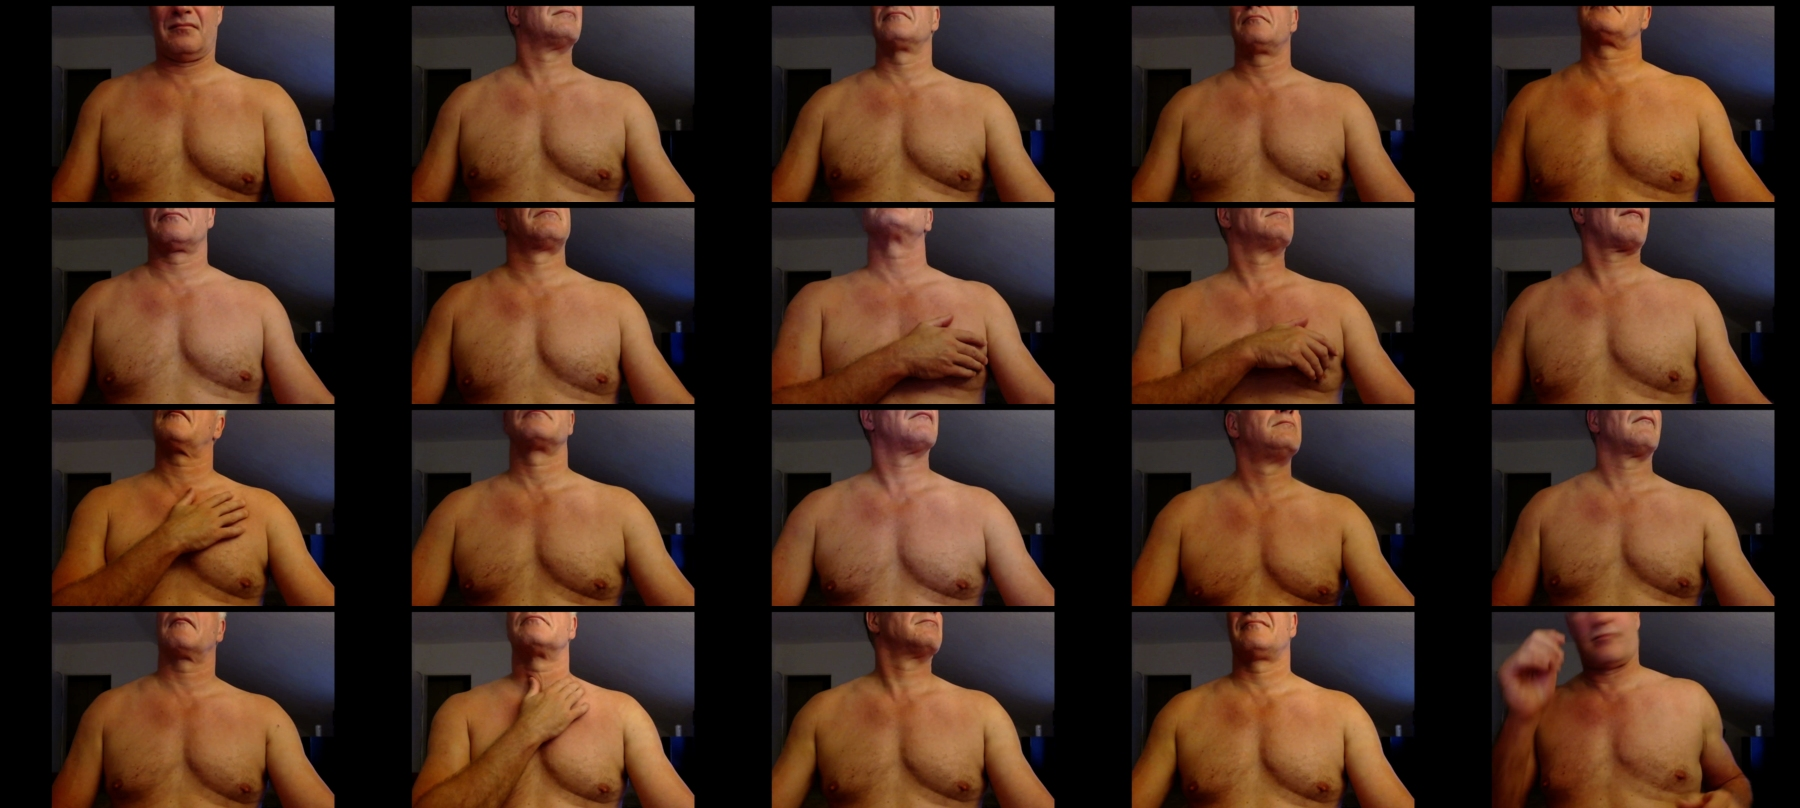 Matte_hh1 Topless CAM SHOW @ Cam4 21-07-2021